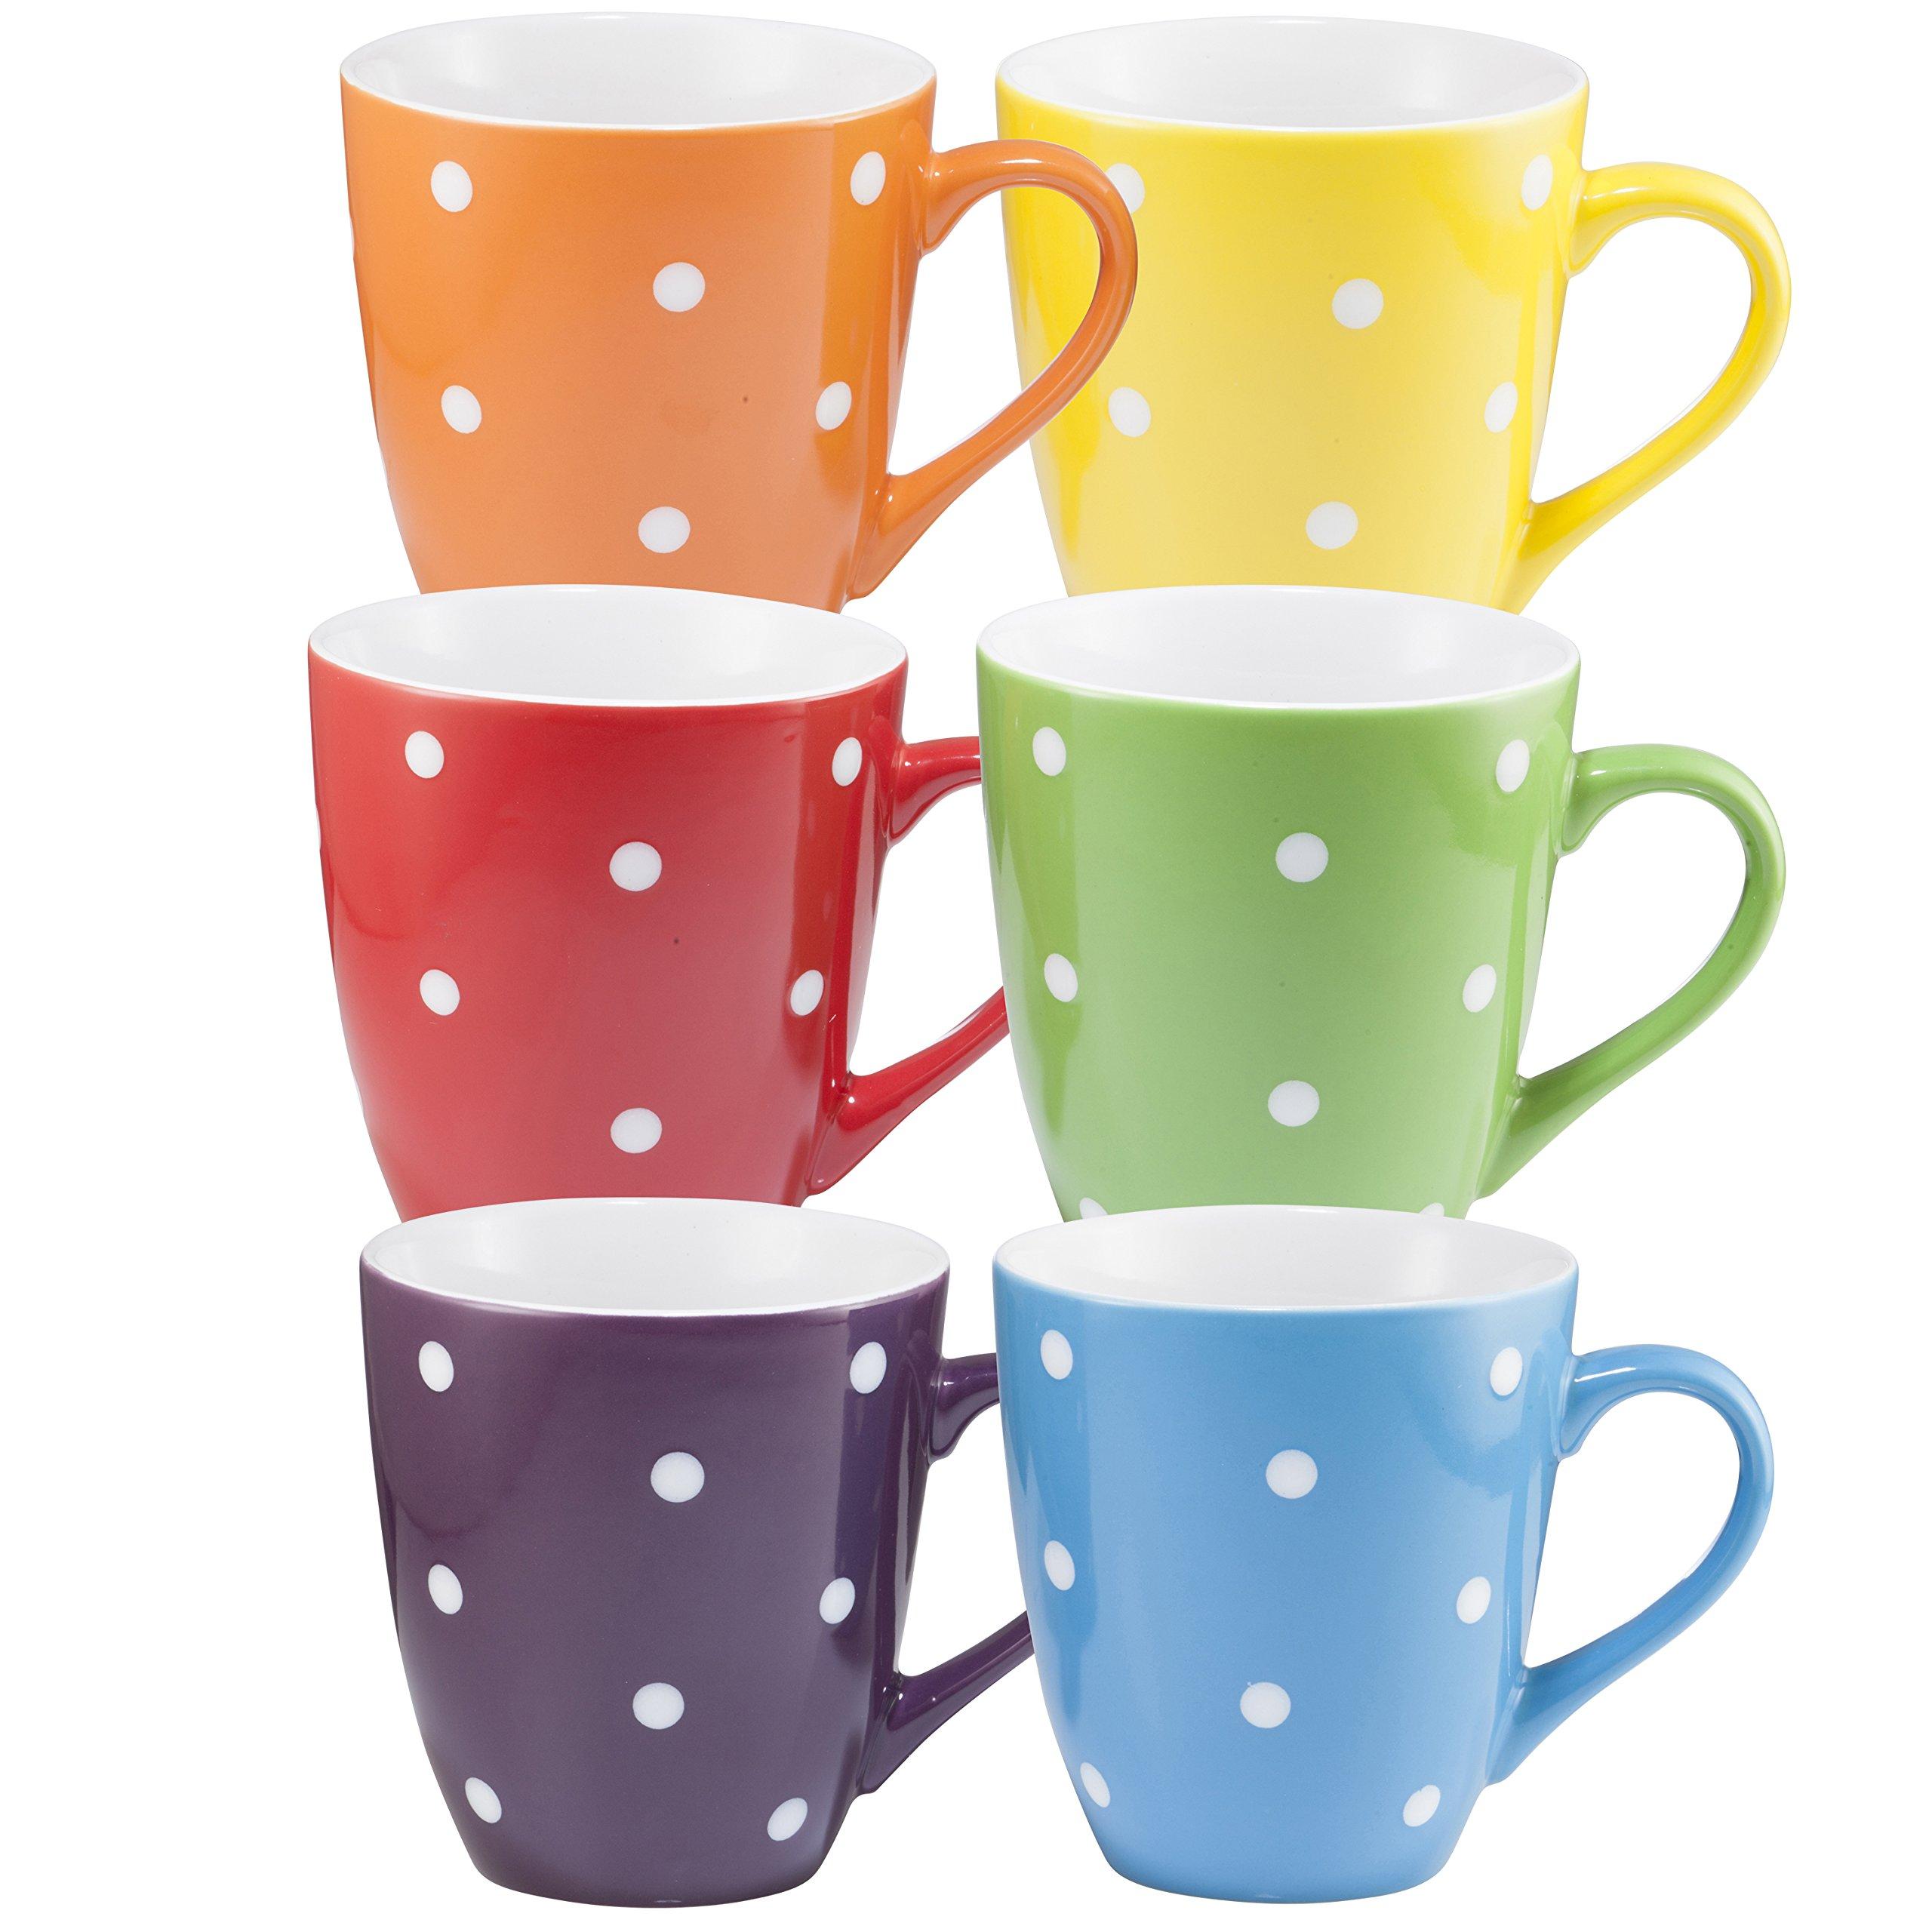 Coffee Mug Set Set of 6 Large-sized 16 Ounce Ceramic Coffee Mugs Restaurant Coffee Mugs By Bruntmor (Polka Dot) by Bruntmor (Image #5)